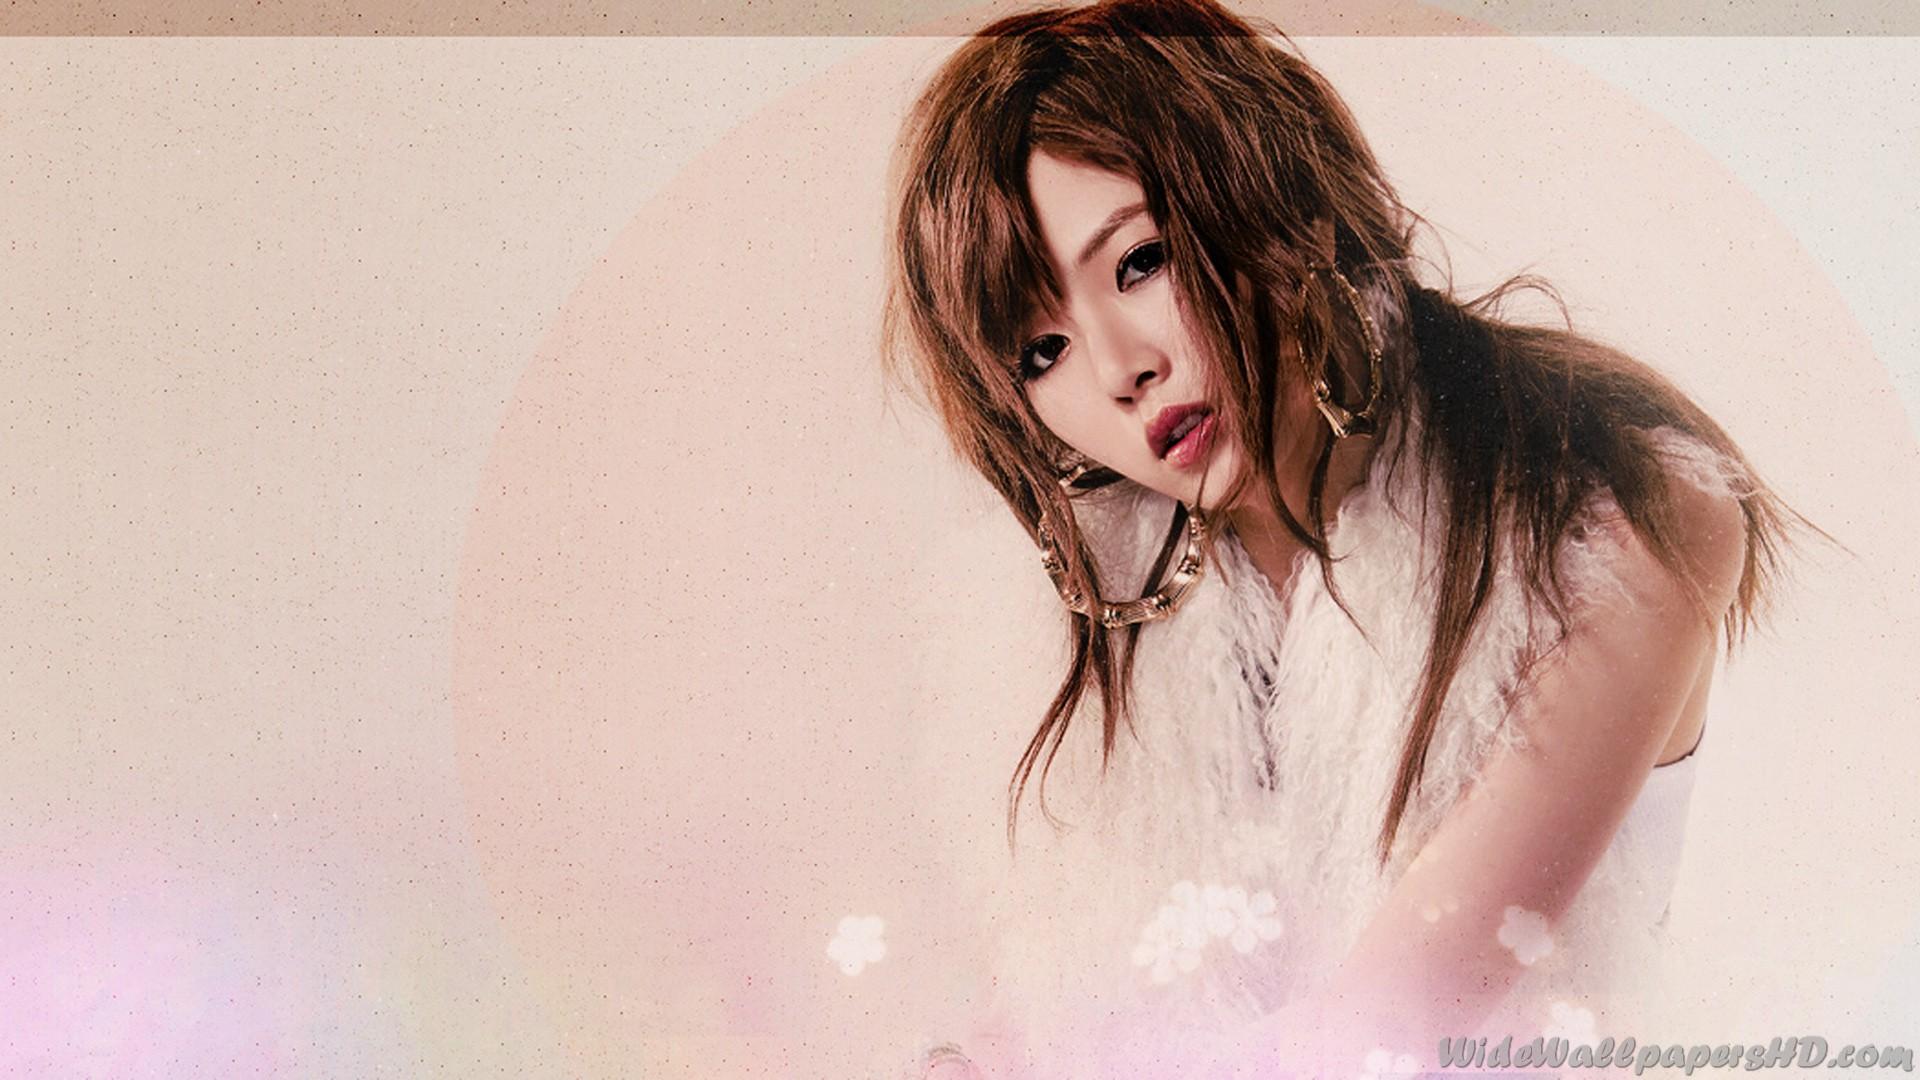 Hyuna in Pink 1080p Hyuna HD Wallpaper